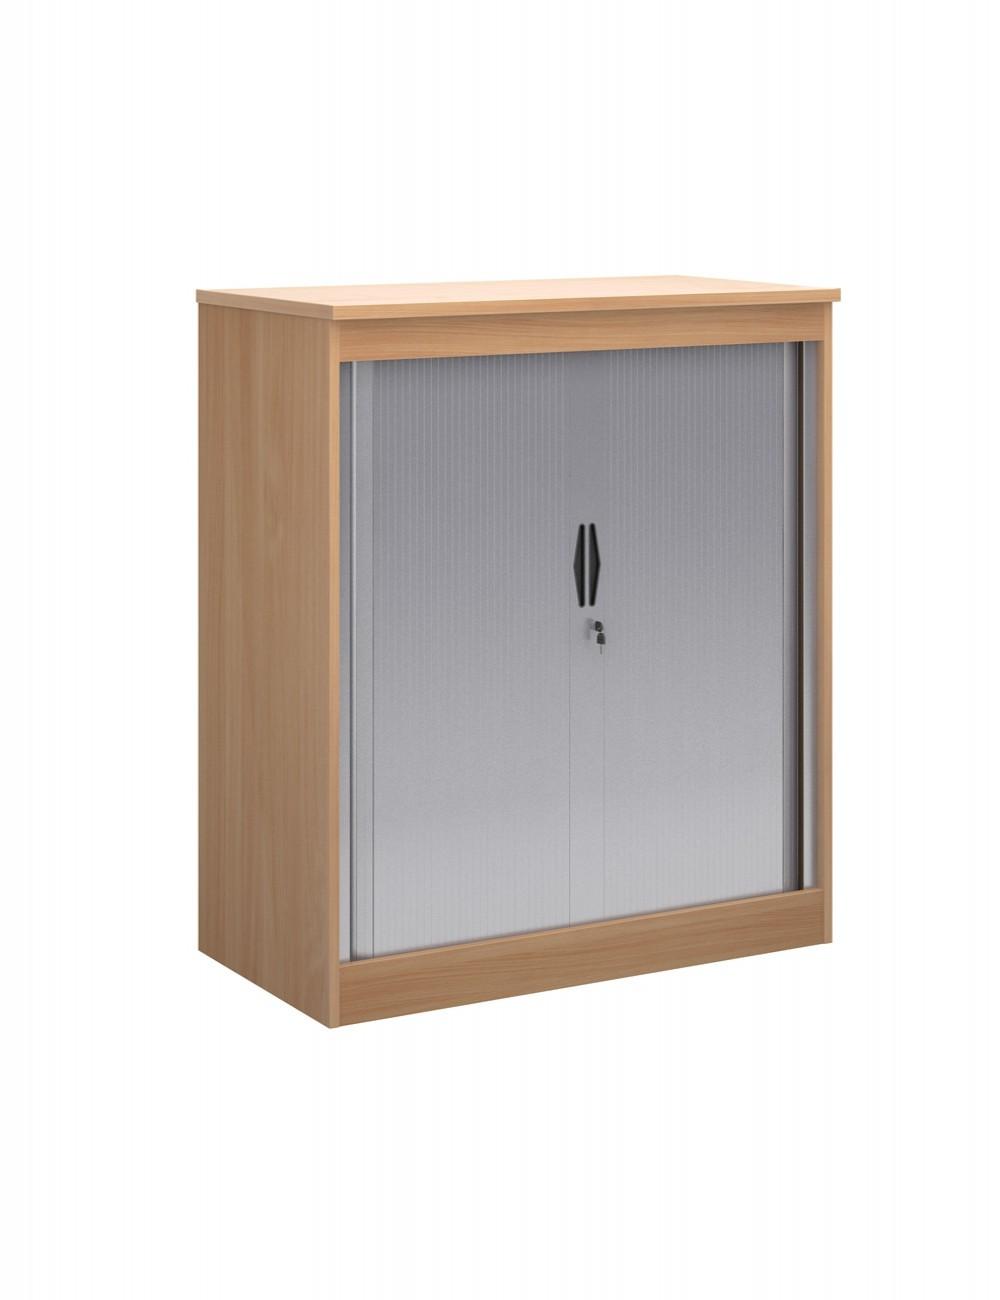 System Horizontal Tambour Door Cupboard St12 121 Office Furniture